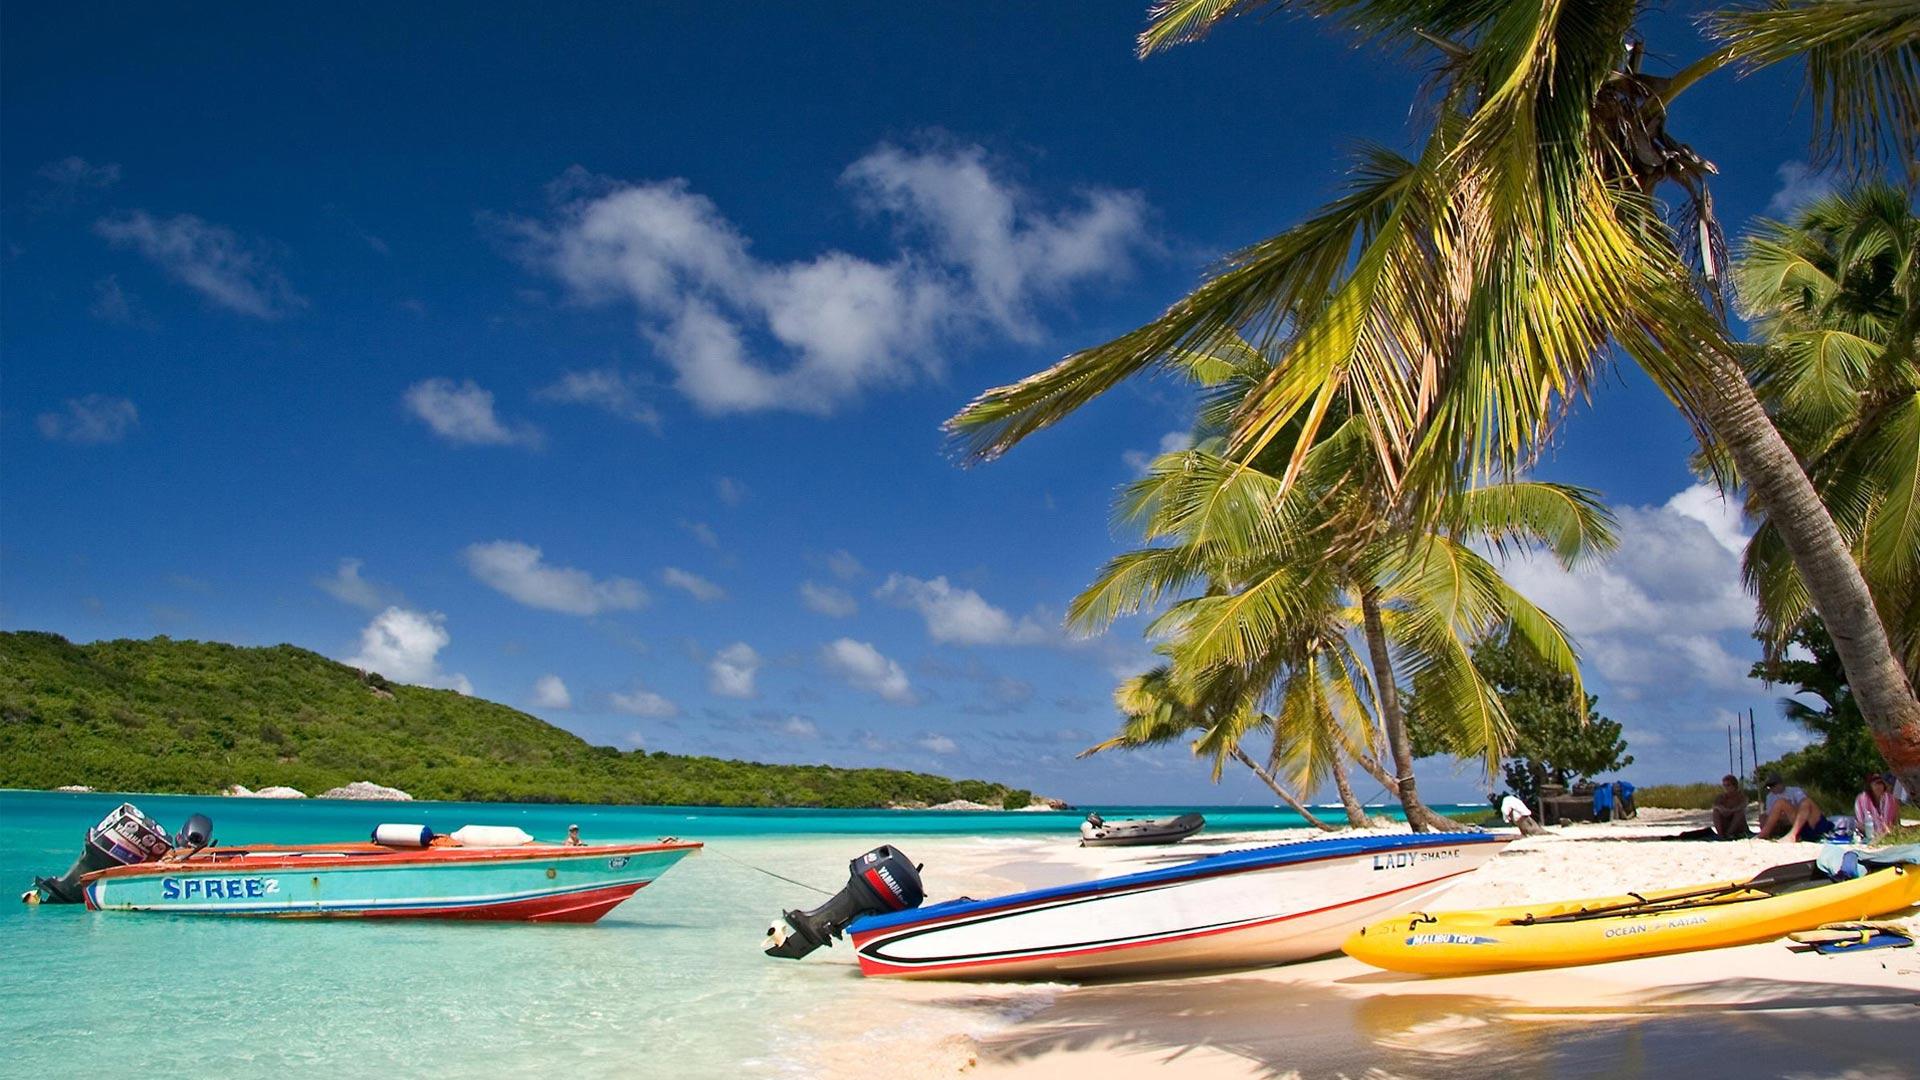 Karibik Segeltörn 2019-2020